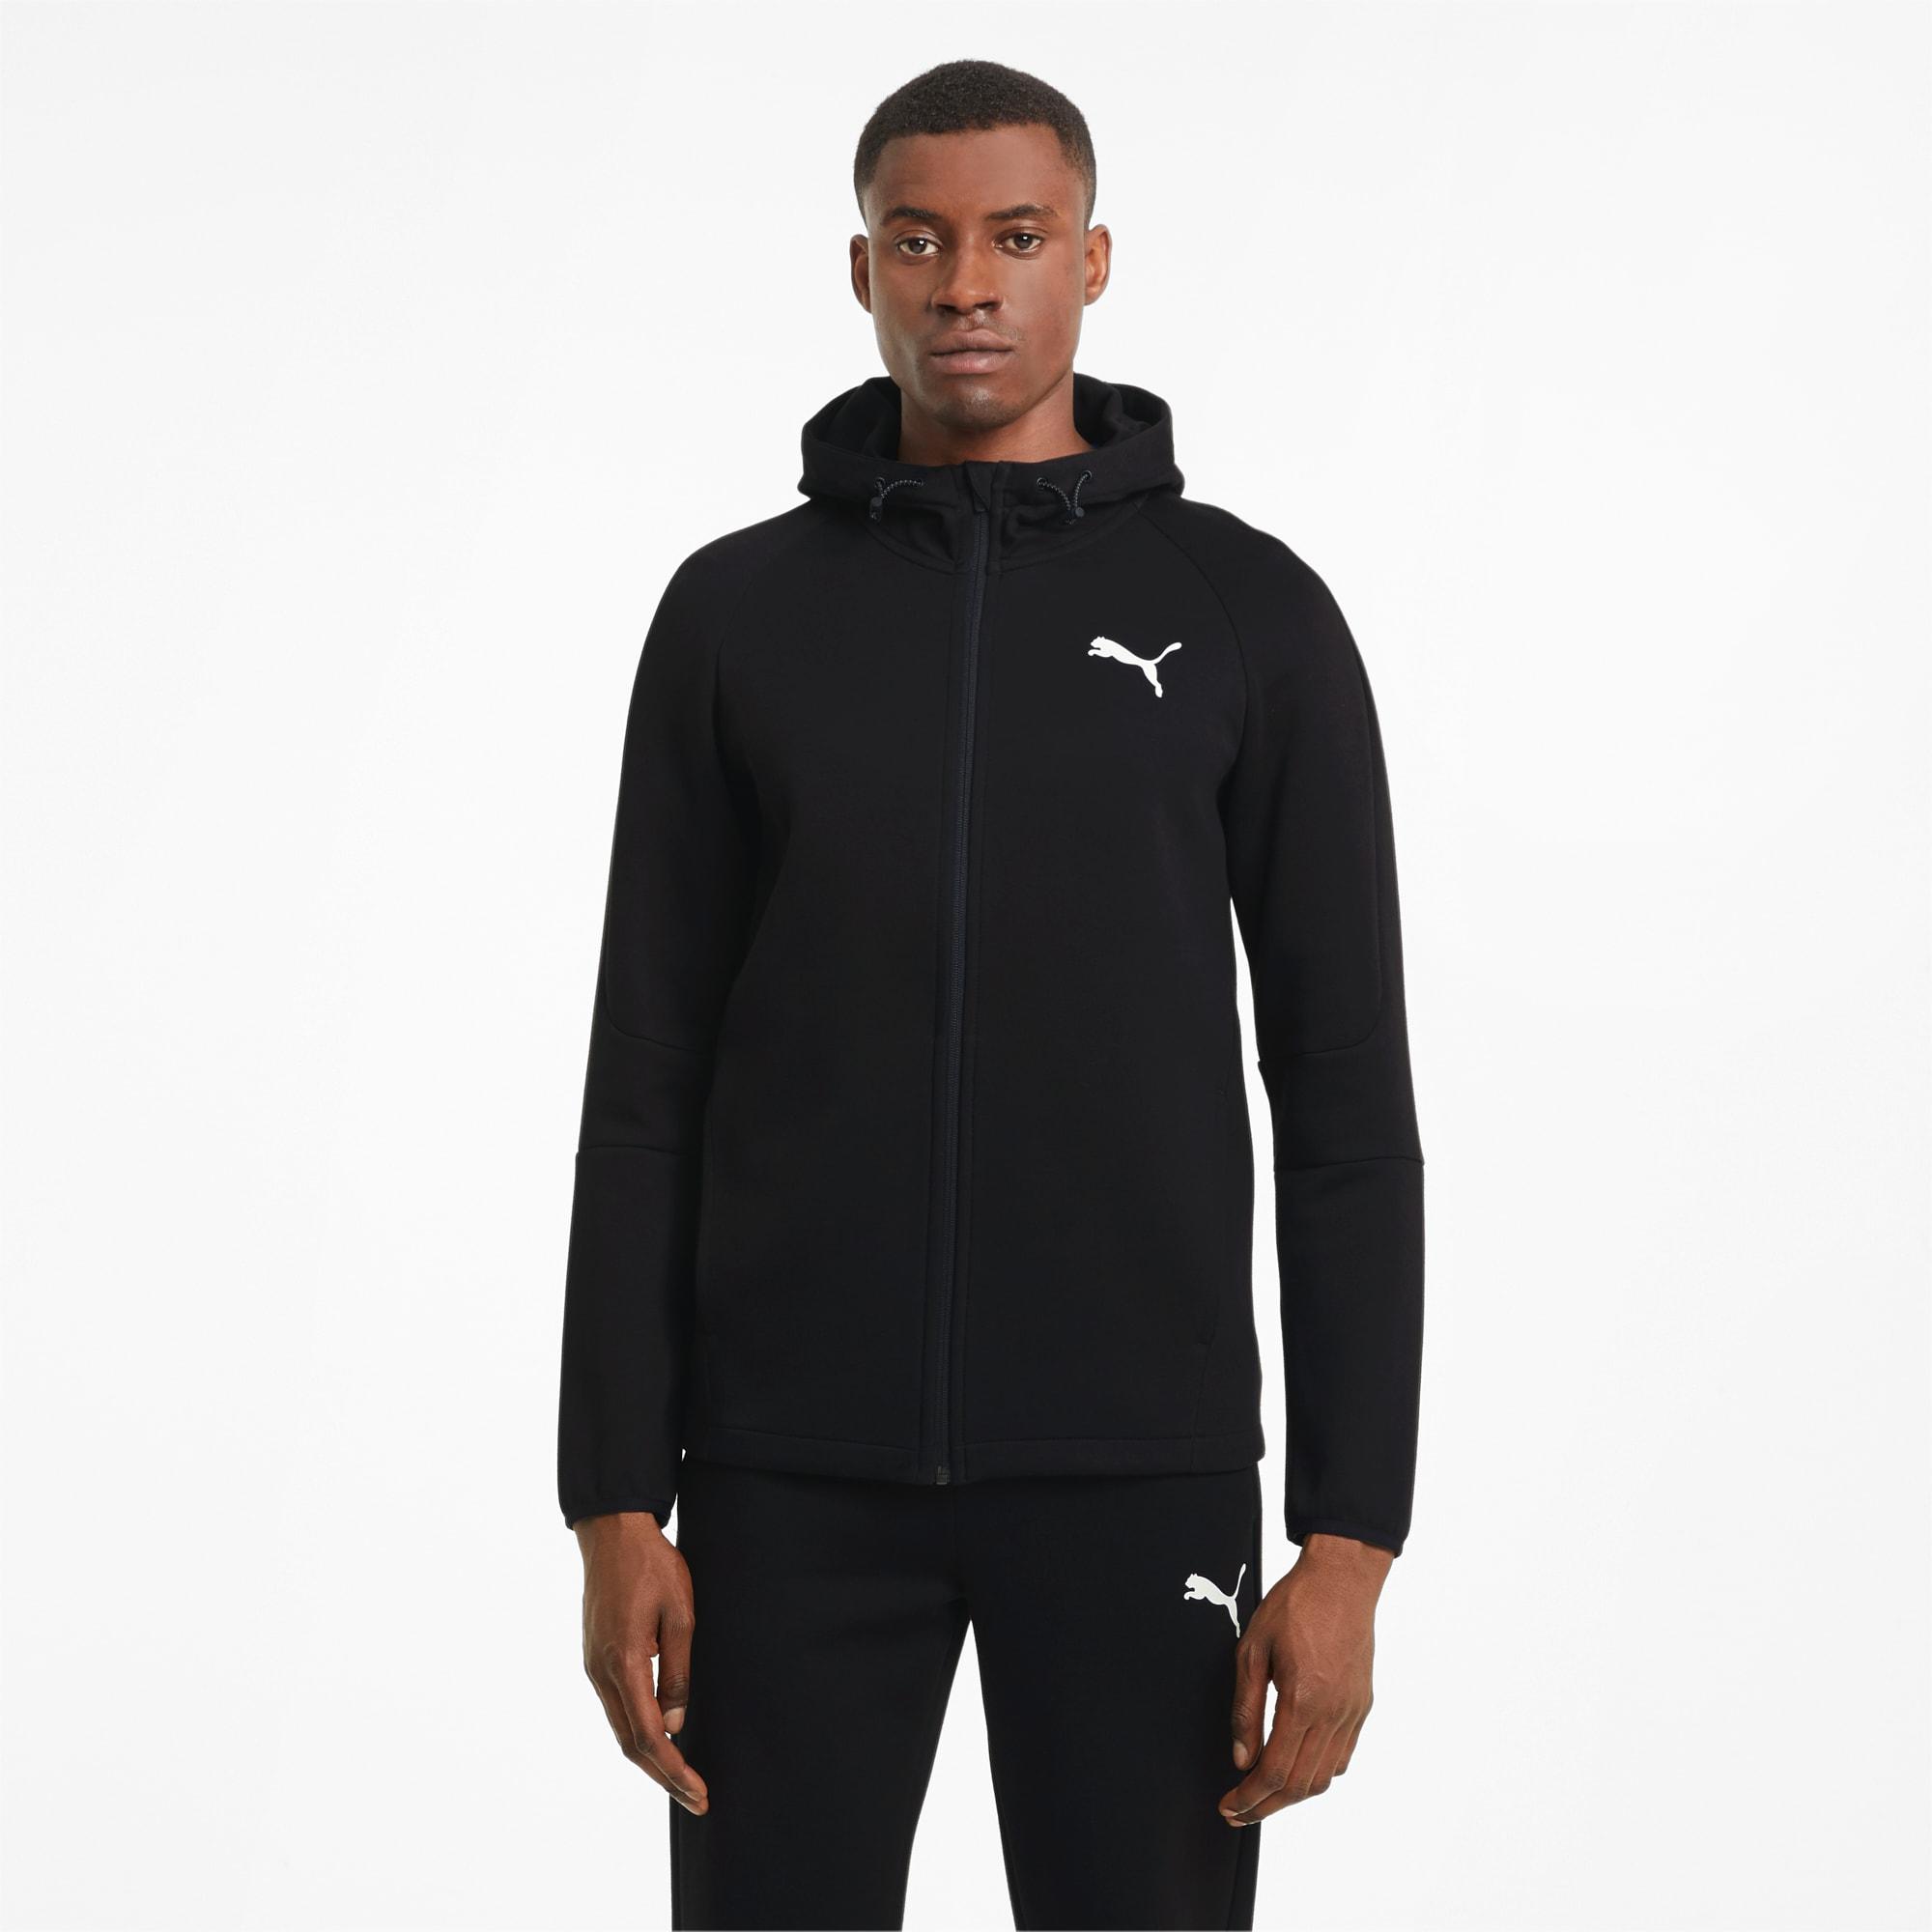 Evostripe Full-Zip Men's Hoodie